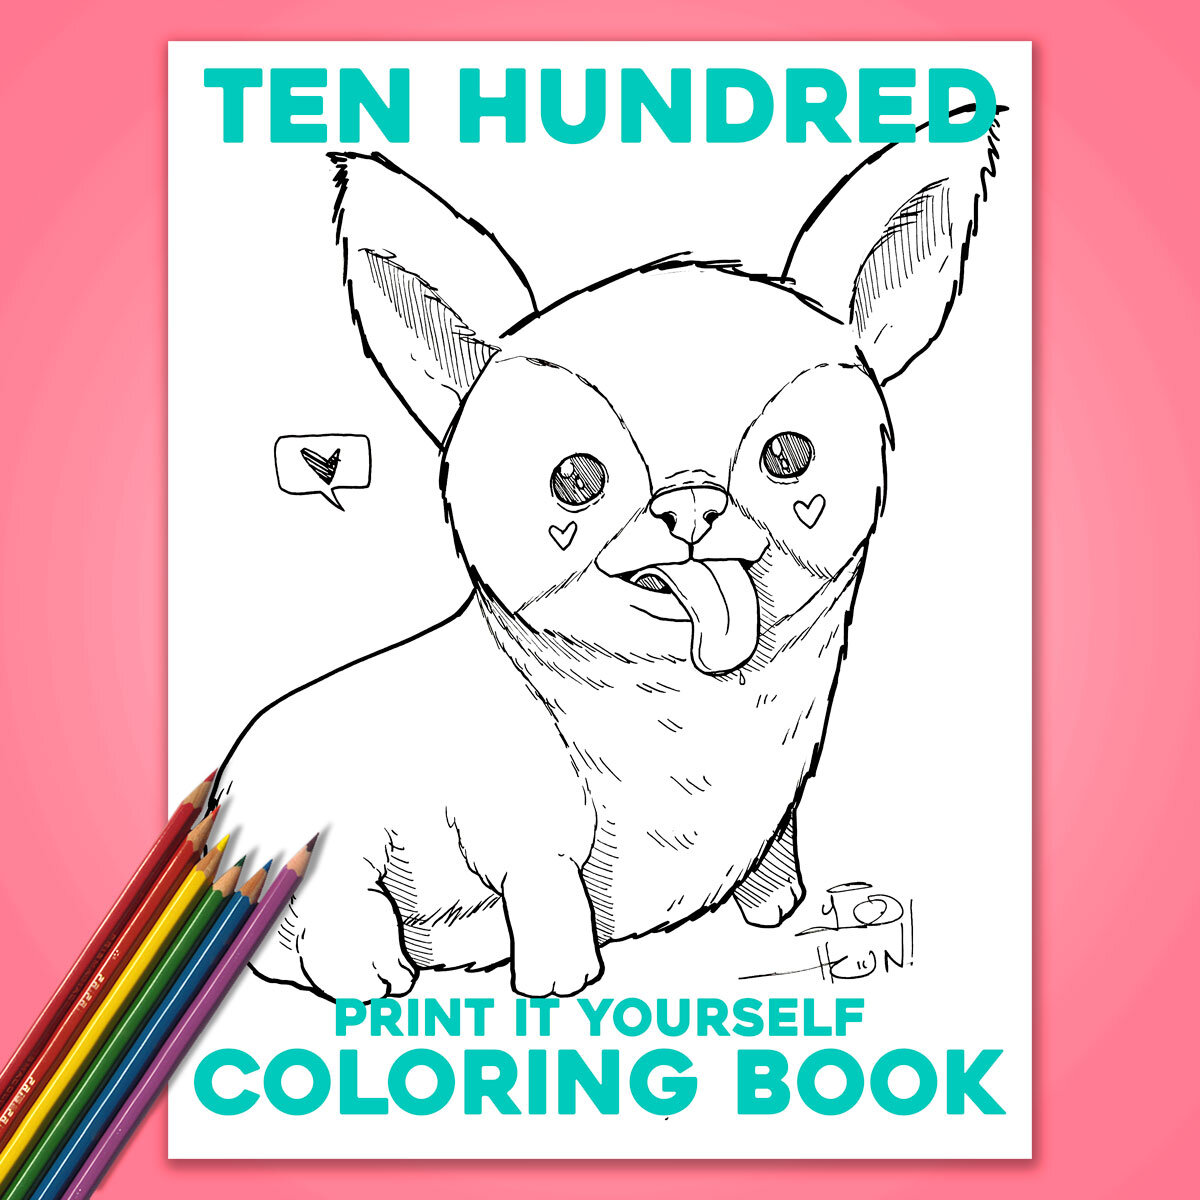 - Coloring Book - Free PRINT IT YOURSELF - Digital Download — Ten